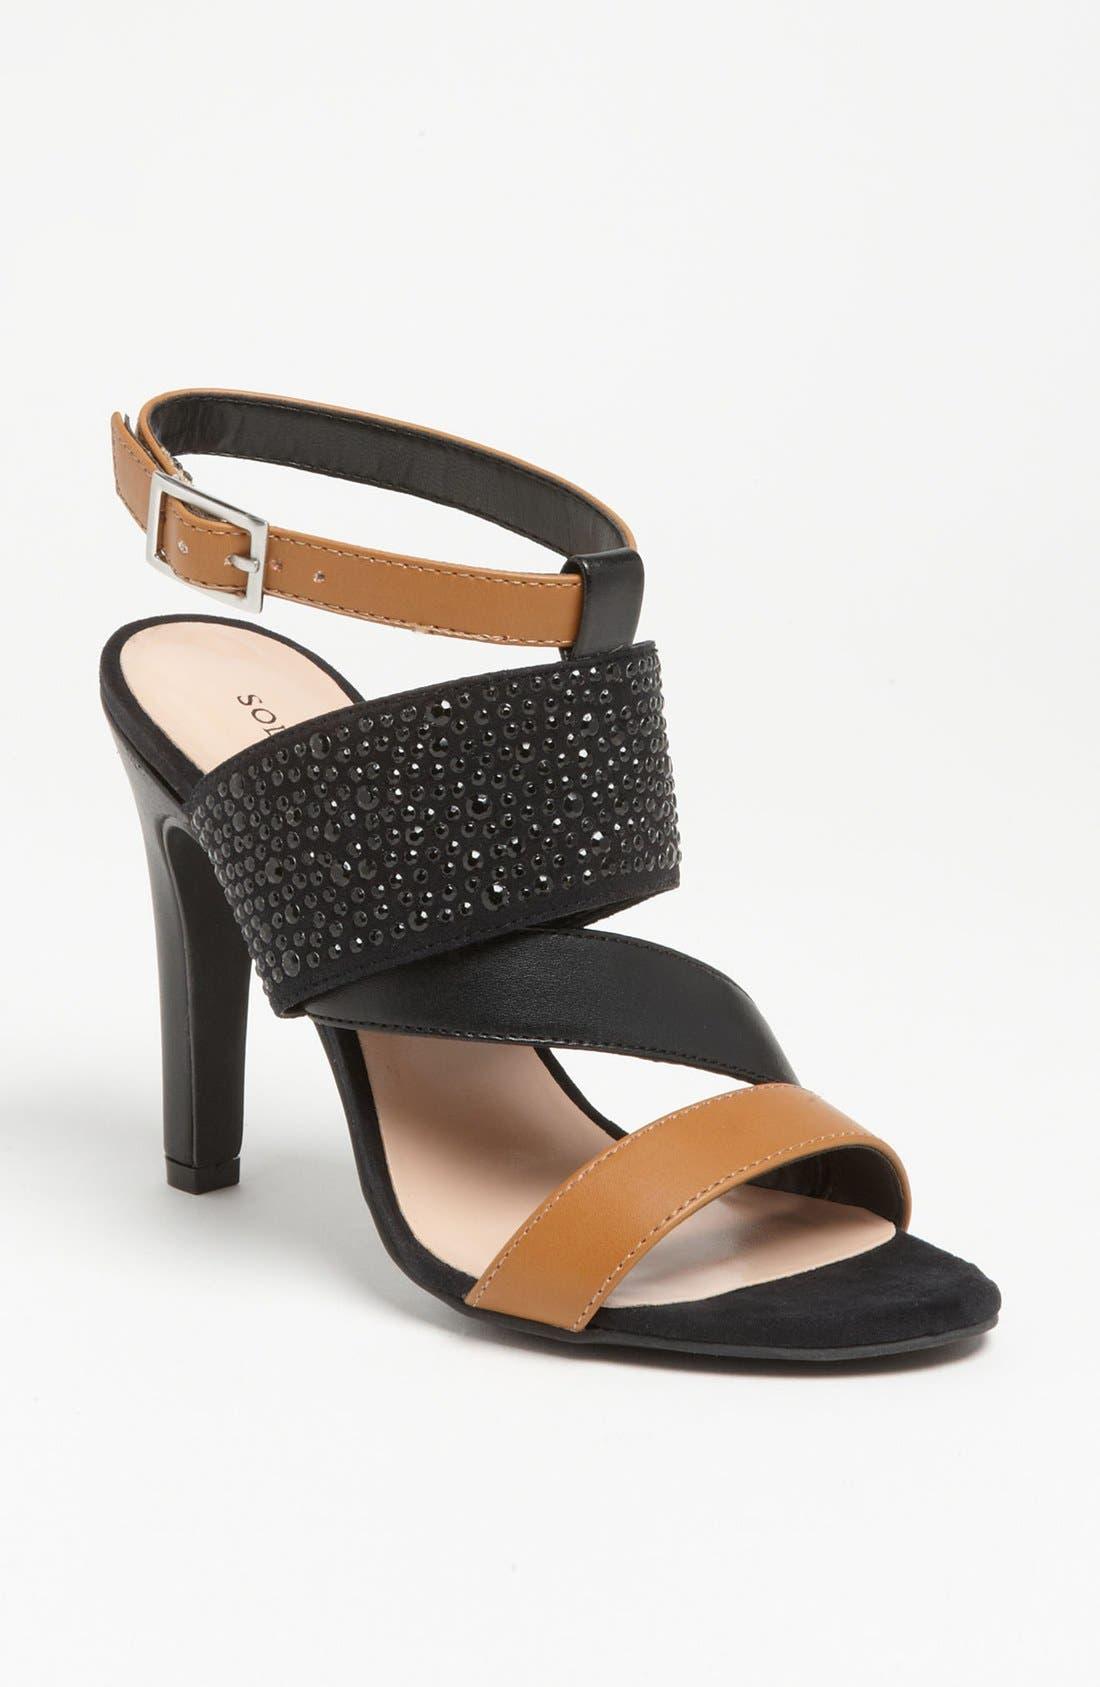 SOLE SOCIETY, 'Savannah' Sandal, Main thumbnail 1, color, 210